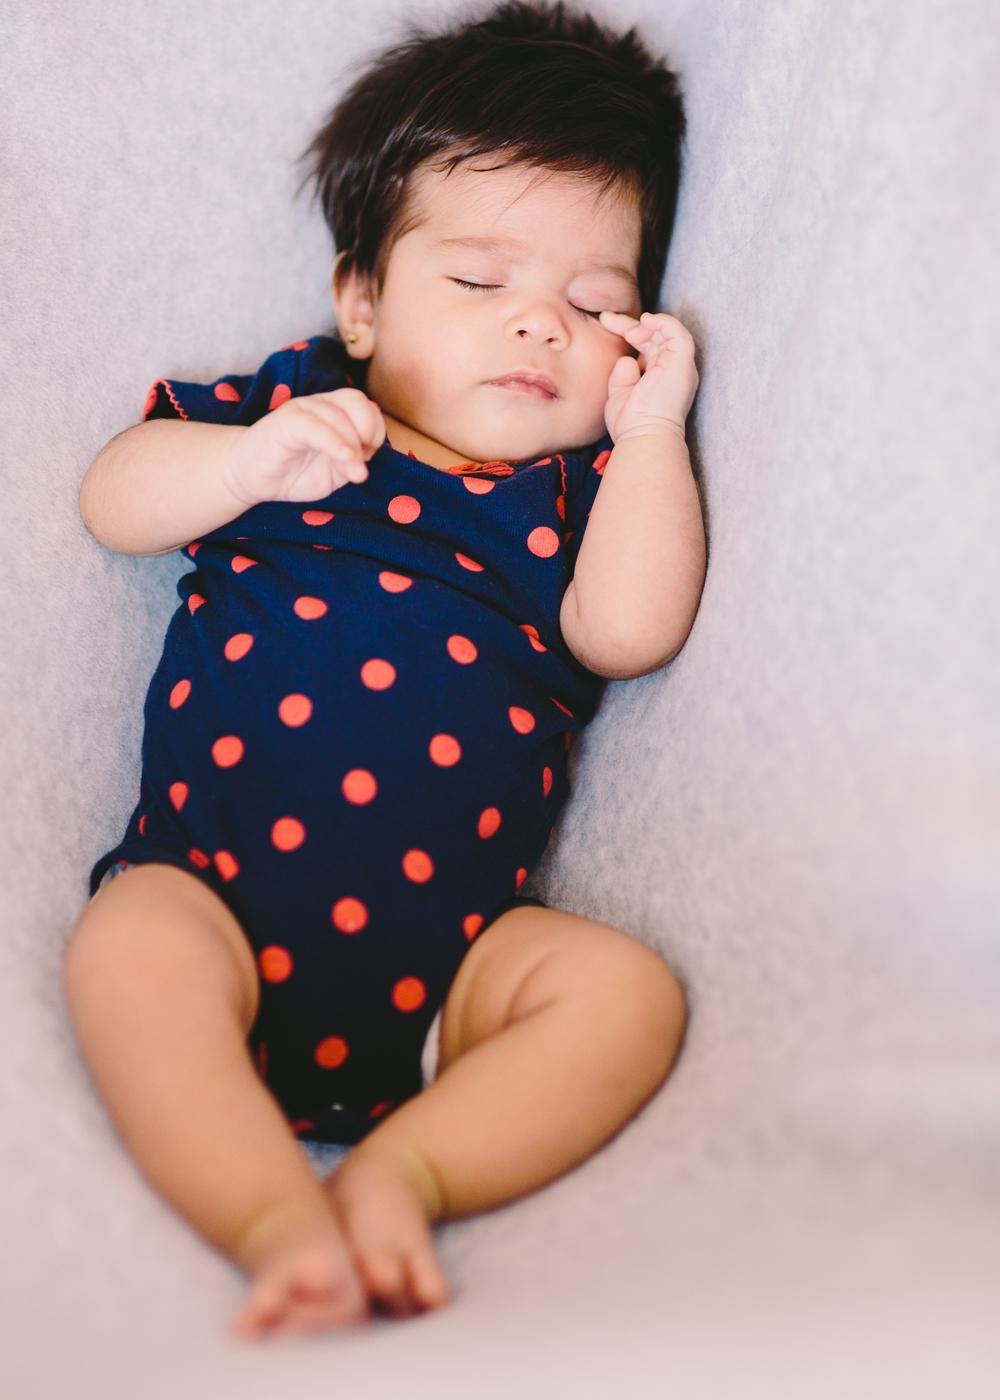 hellosolphoto-fotografia-boda-maternity-6